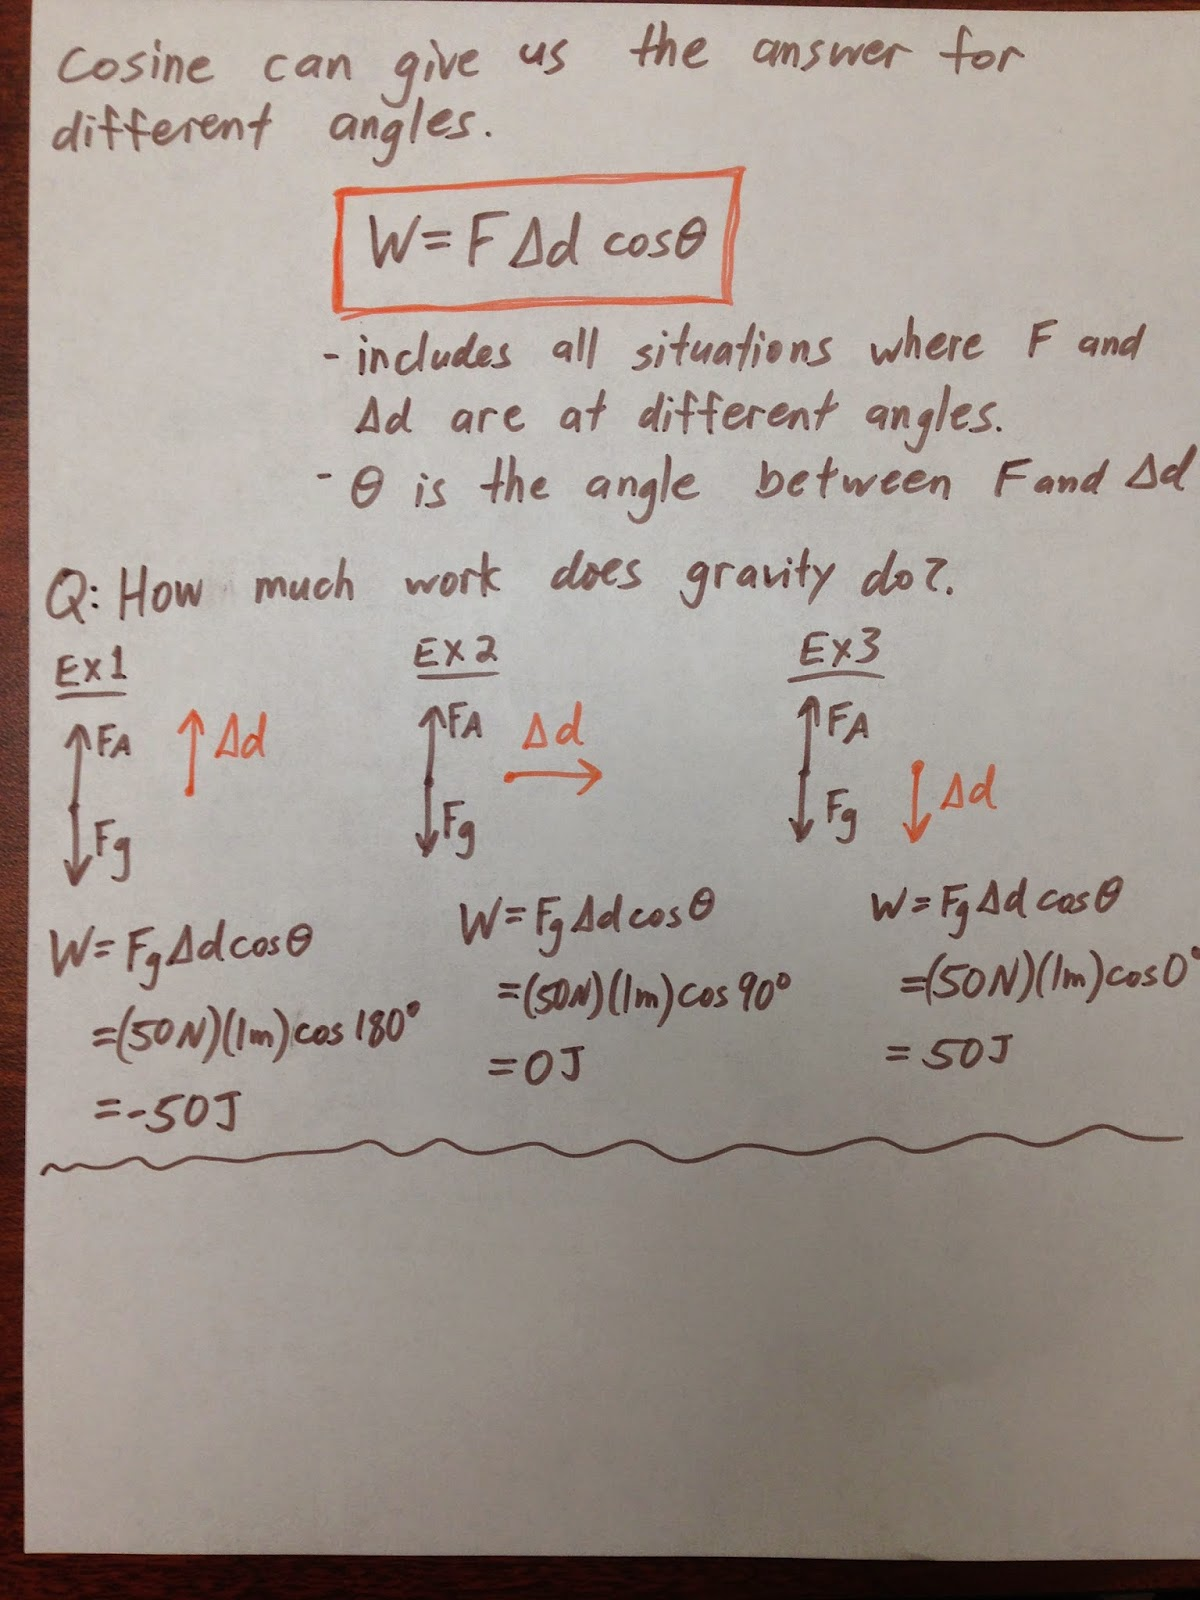 Energy Work And Power Worksheet